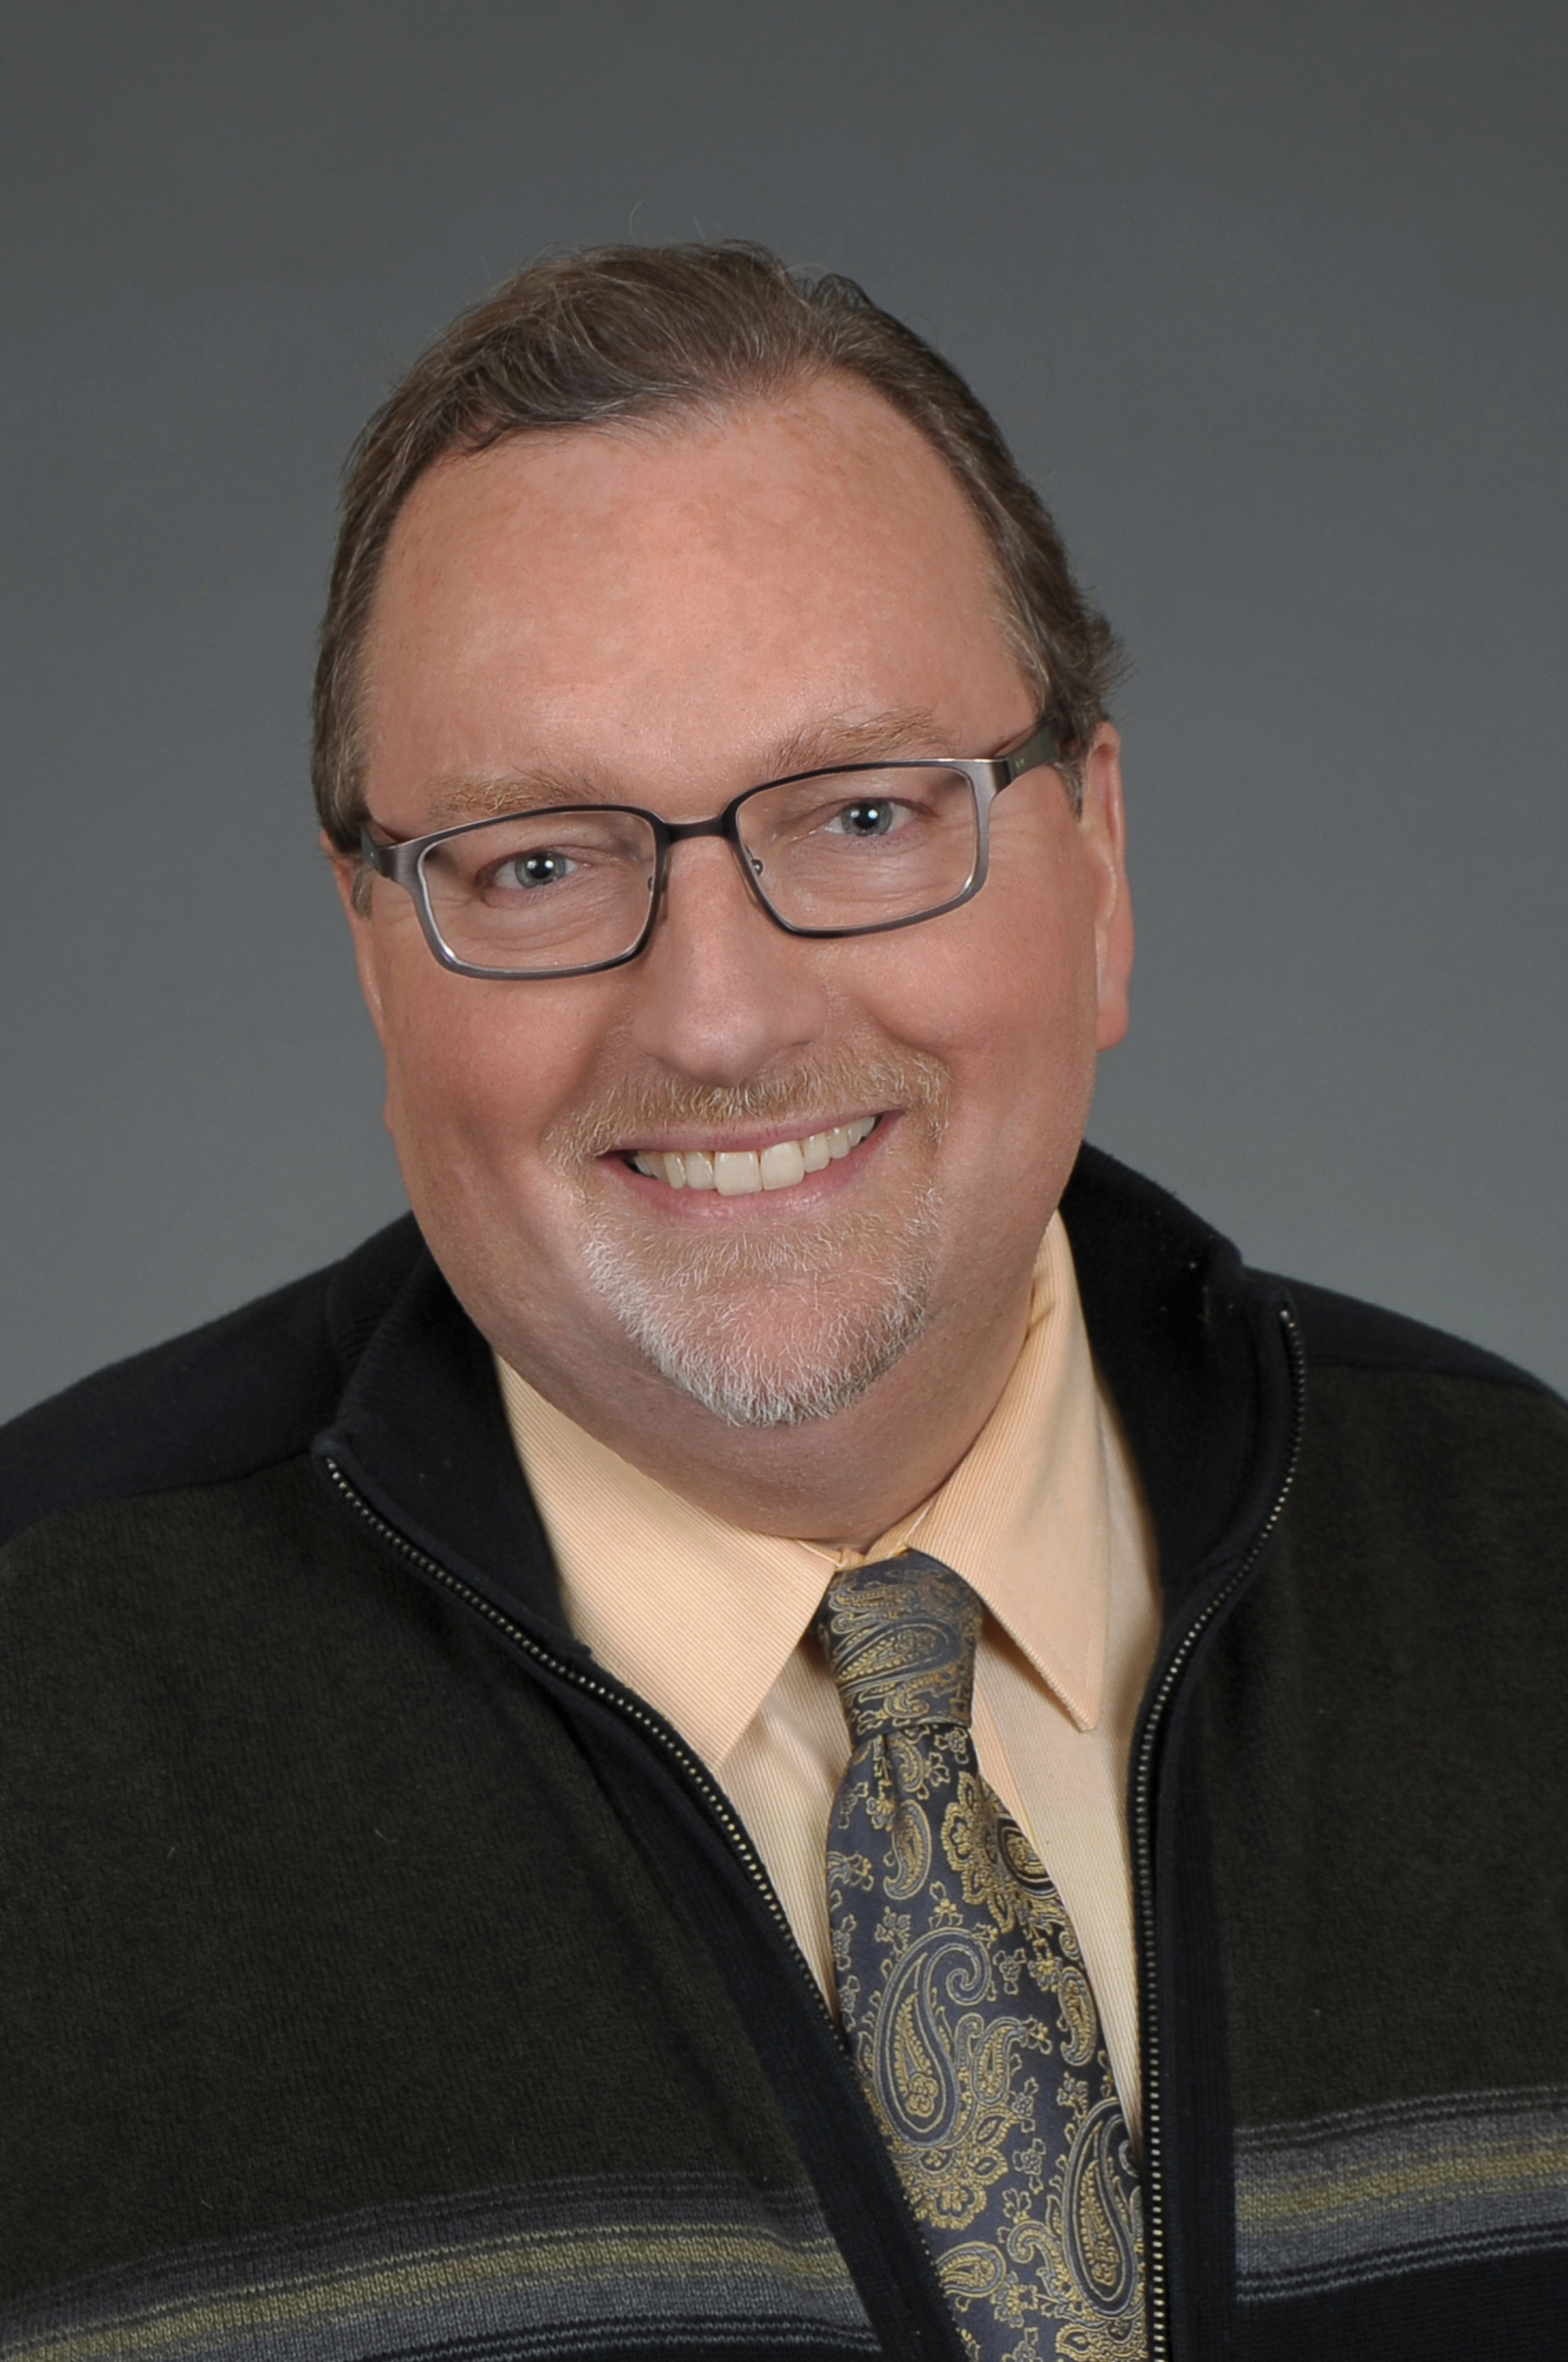 Steve HIRES (002)